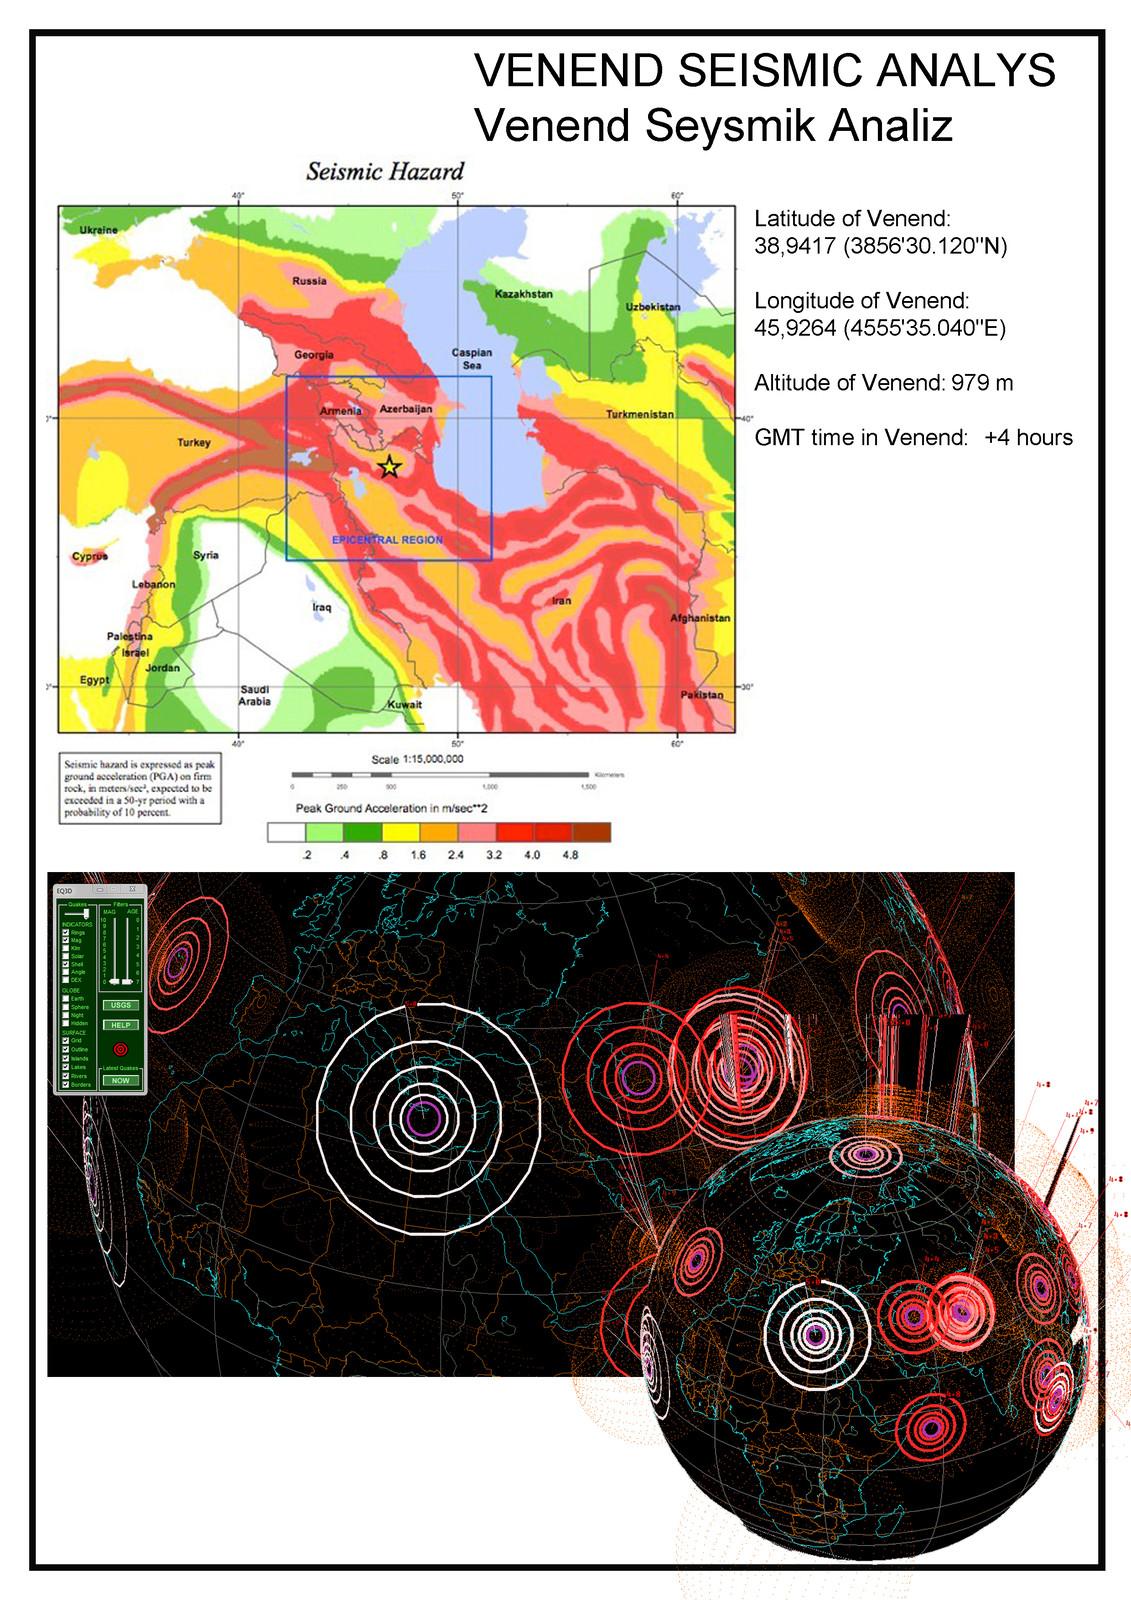 Venend Seismic Analysis